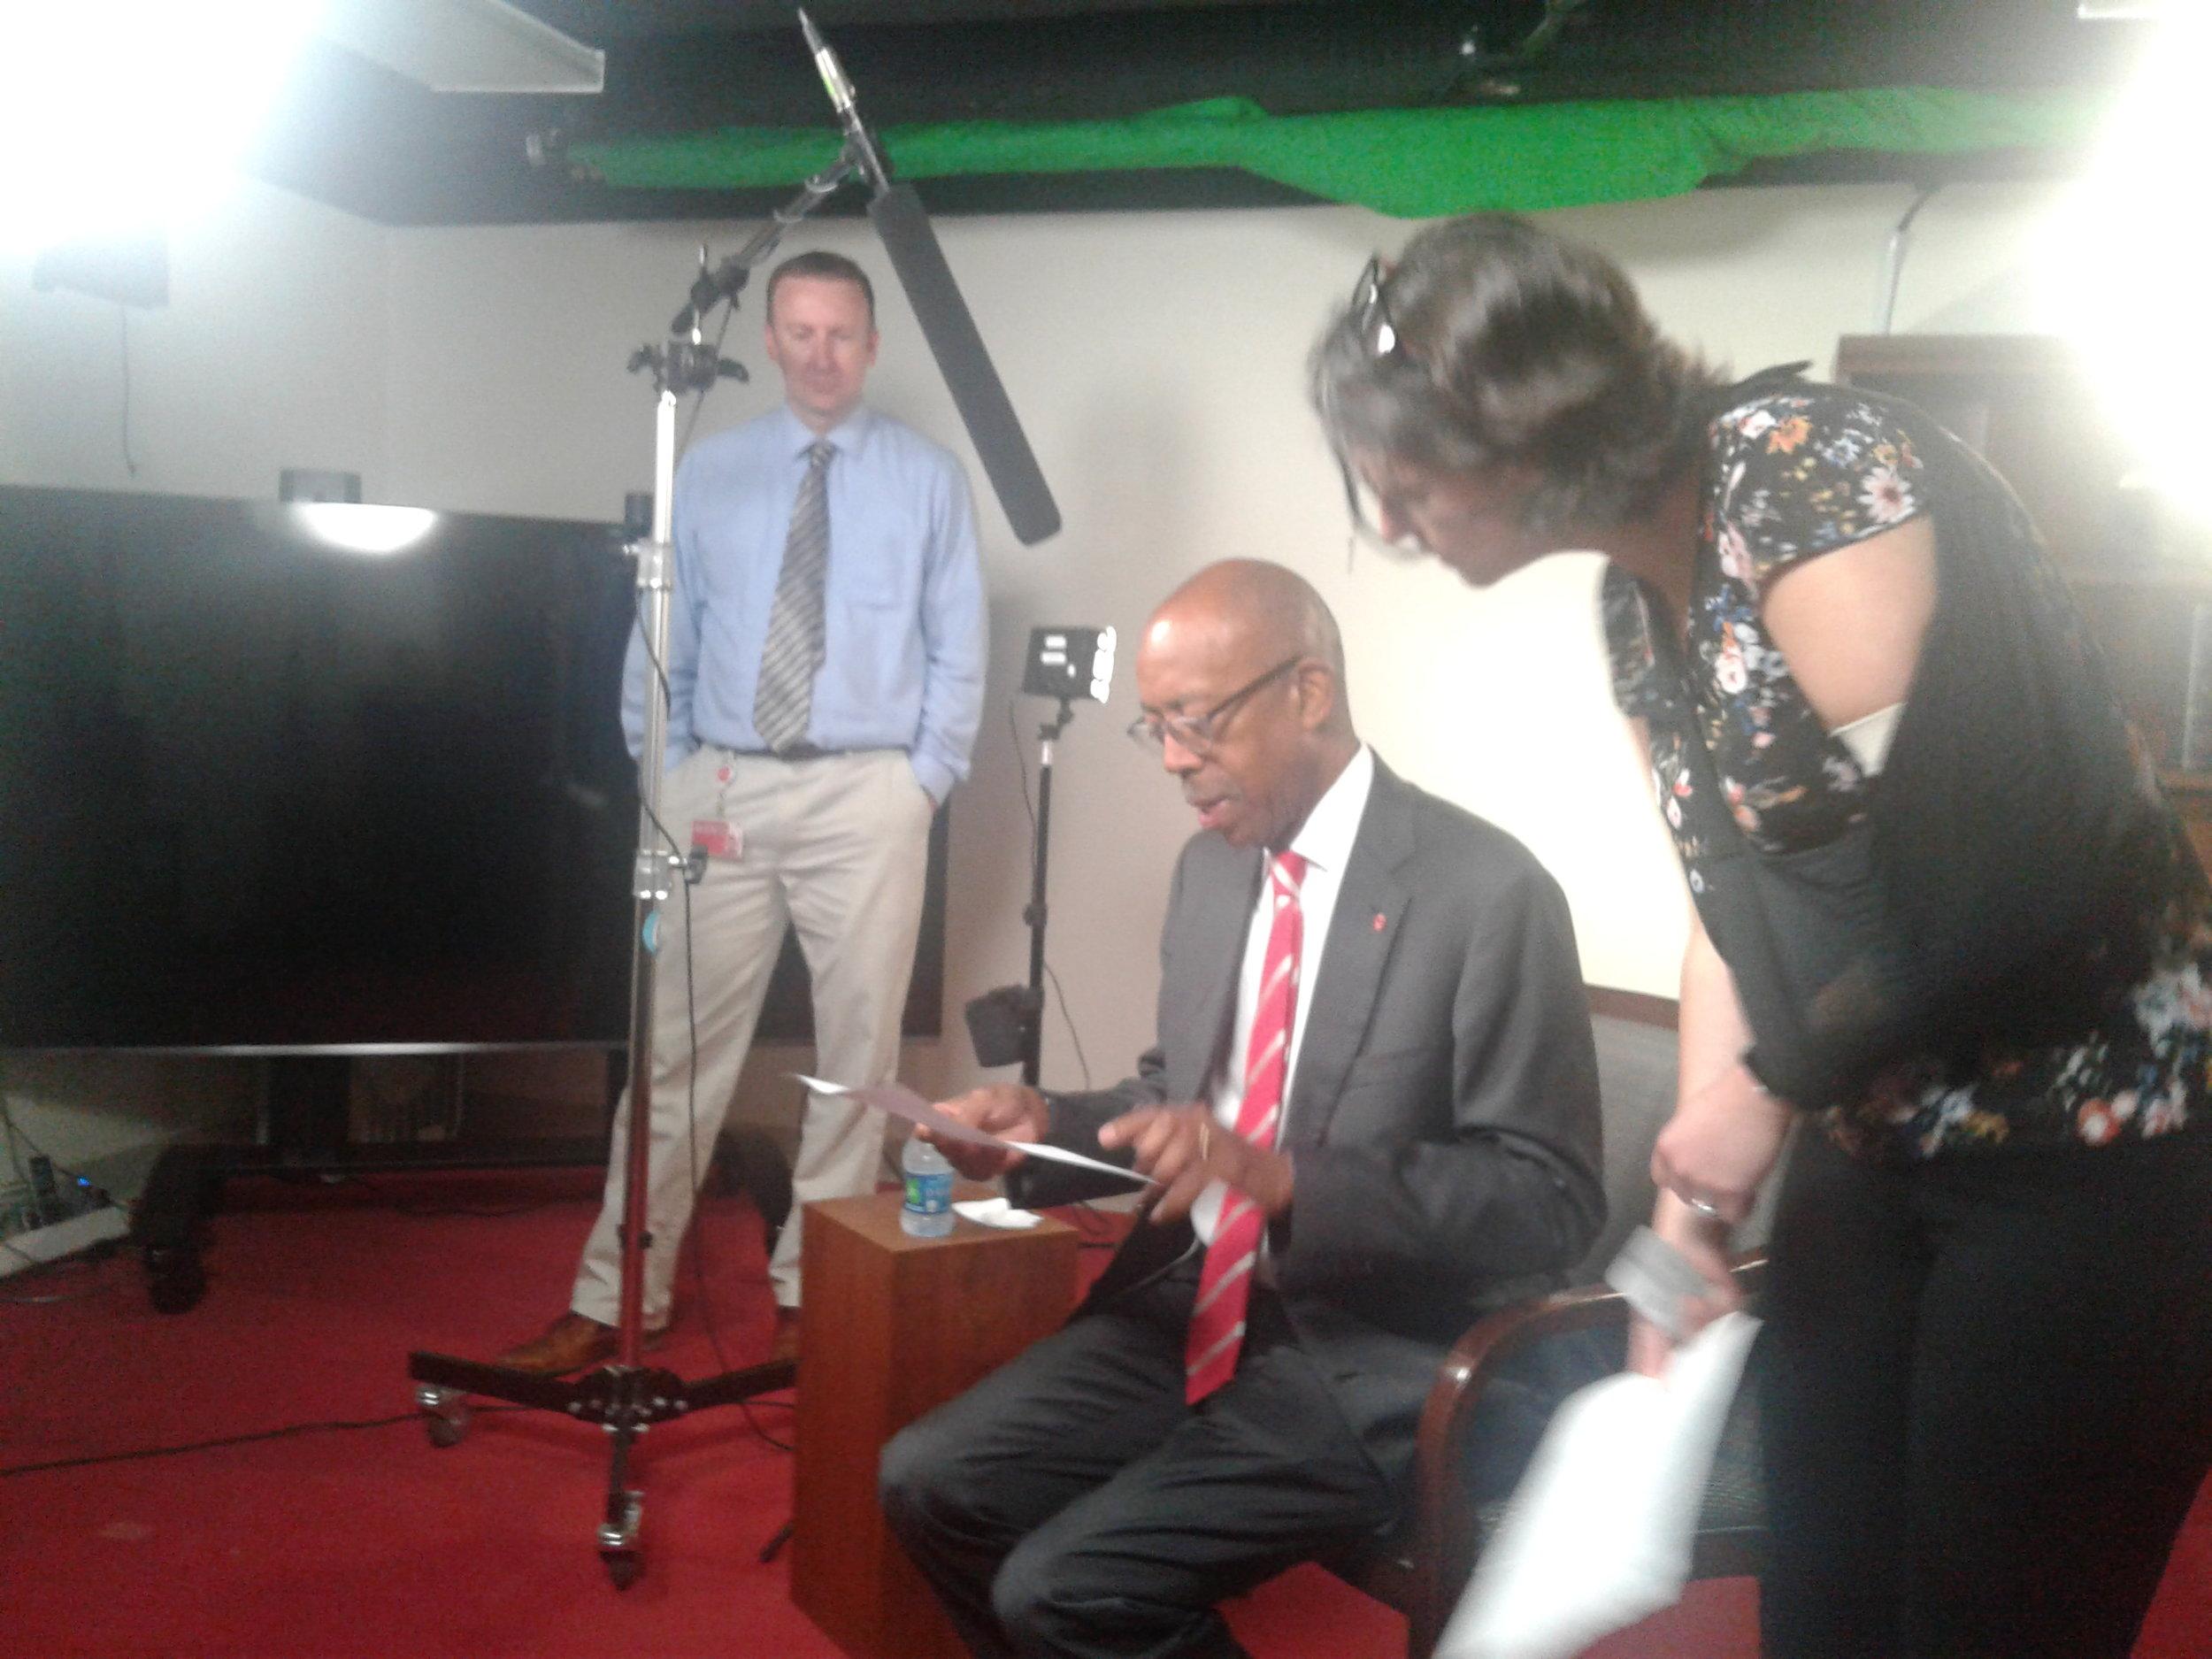 The Ohio State University President Dr. Michael V. Drake, center, prepares for 'Voice & Vision' video shoot.